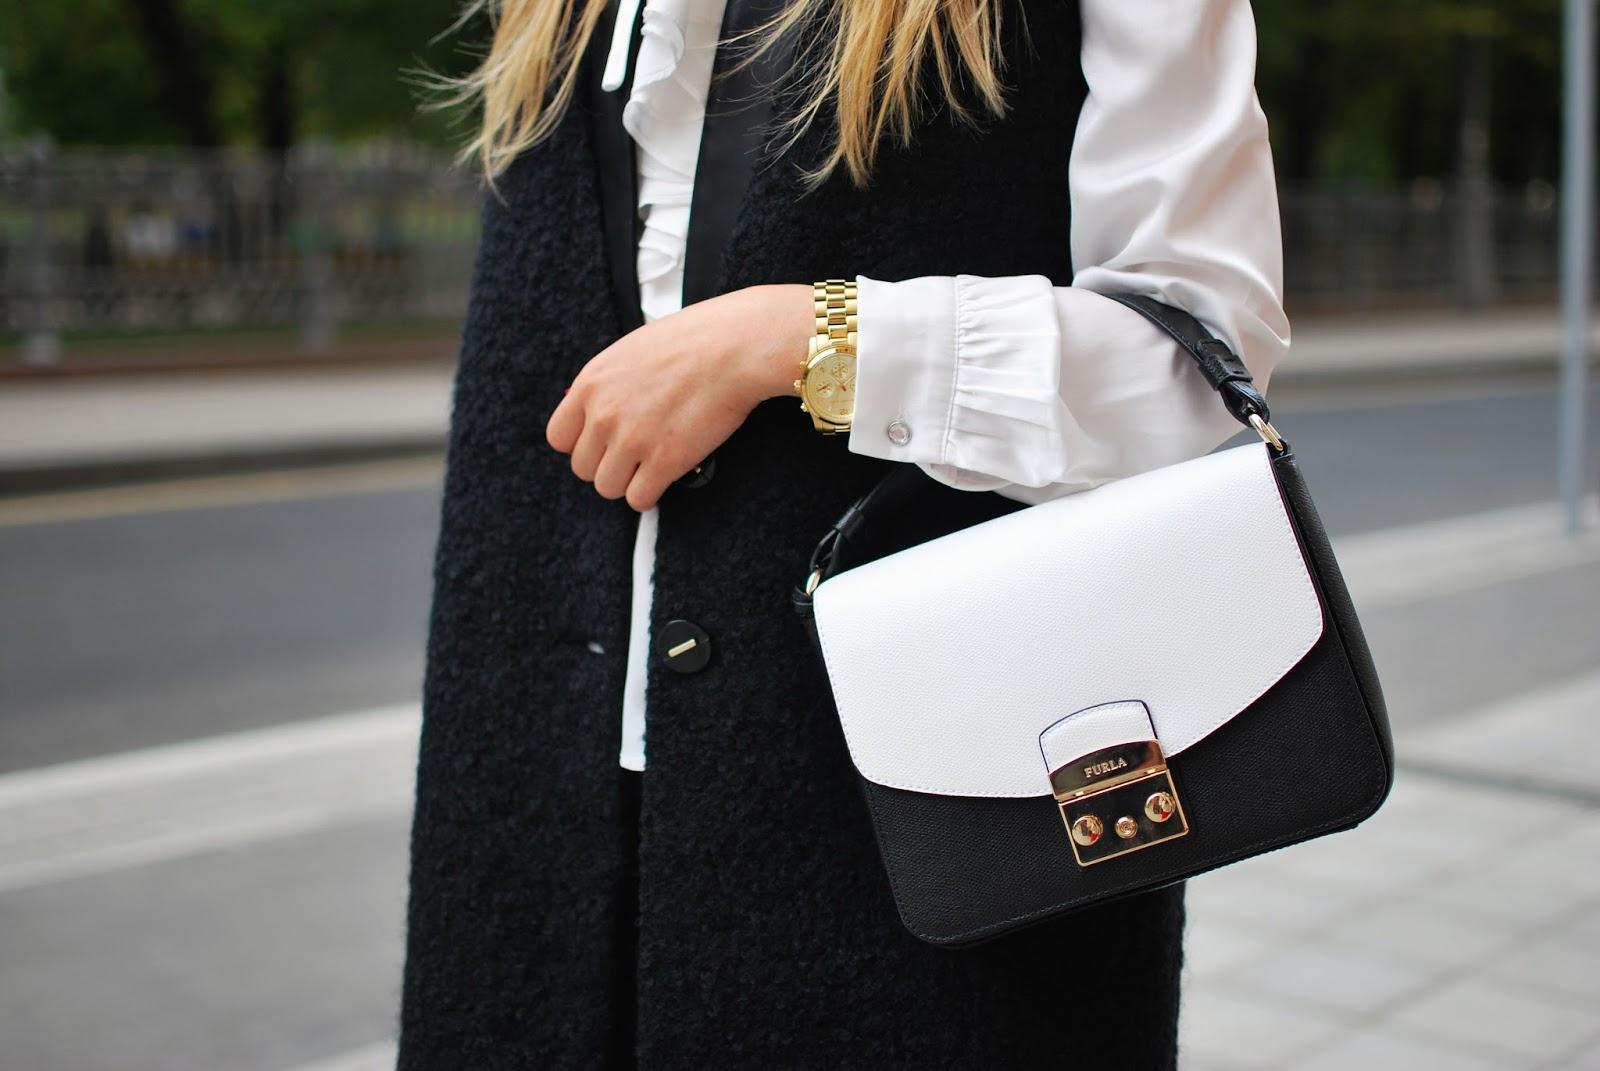 fashion bag furla, furla bag,уличная мода осень 2015,тренды осени